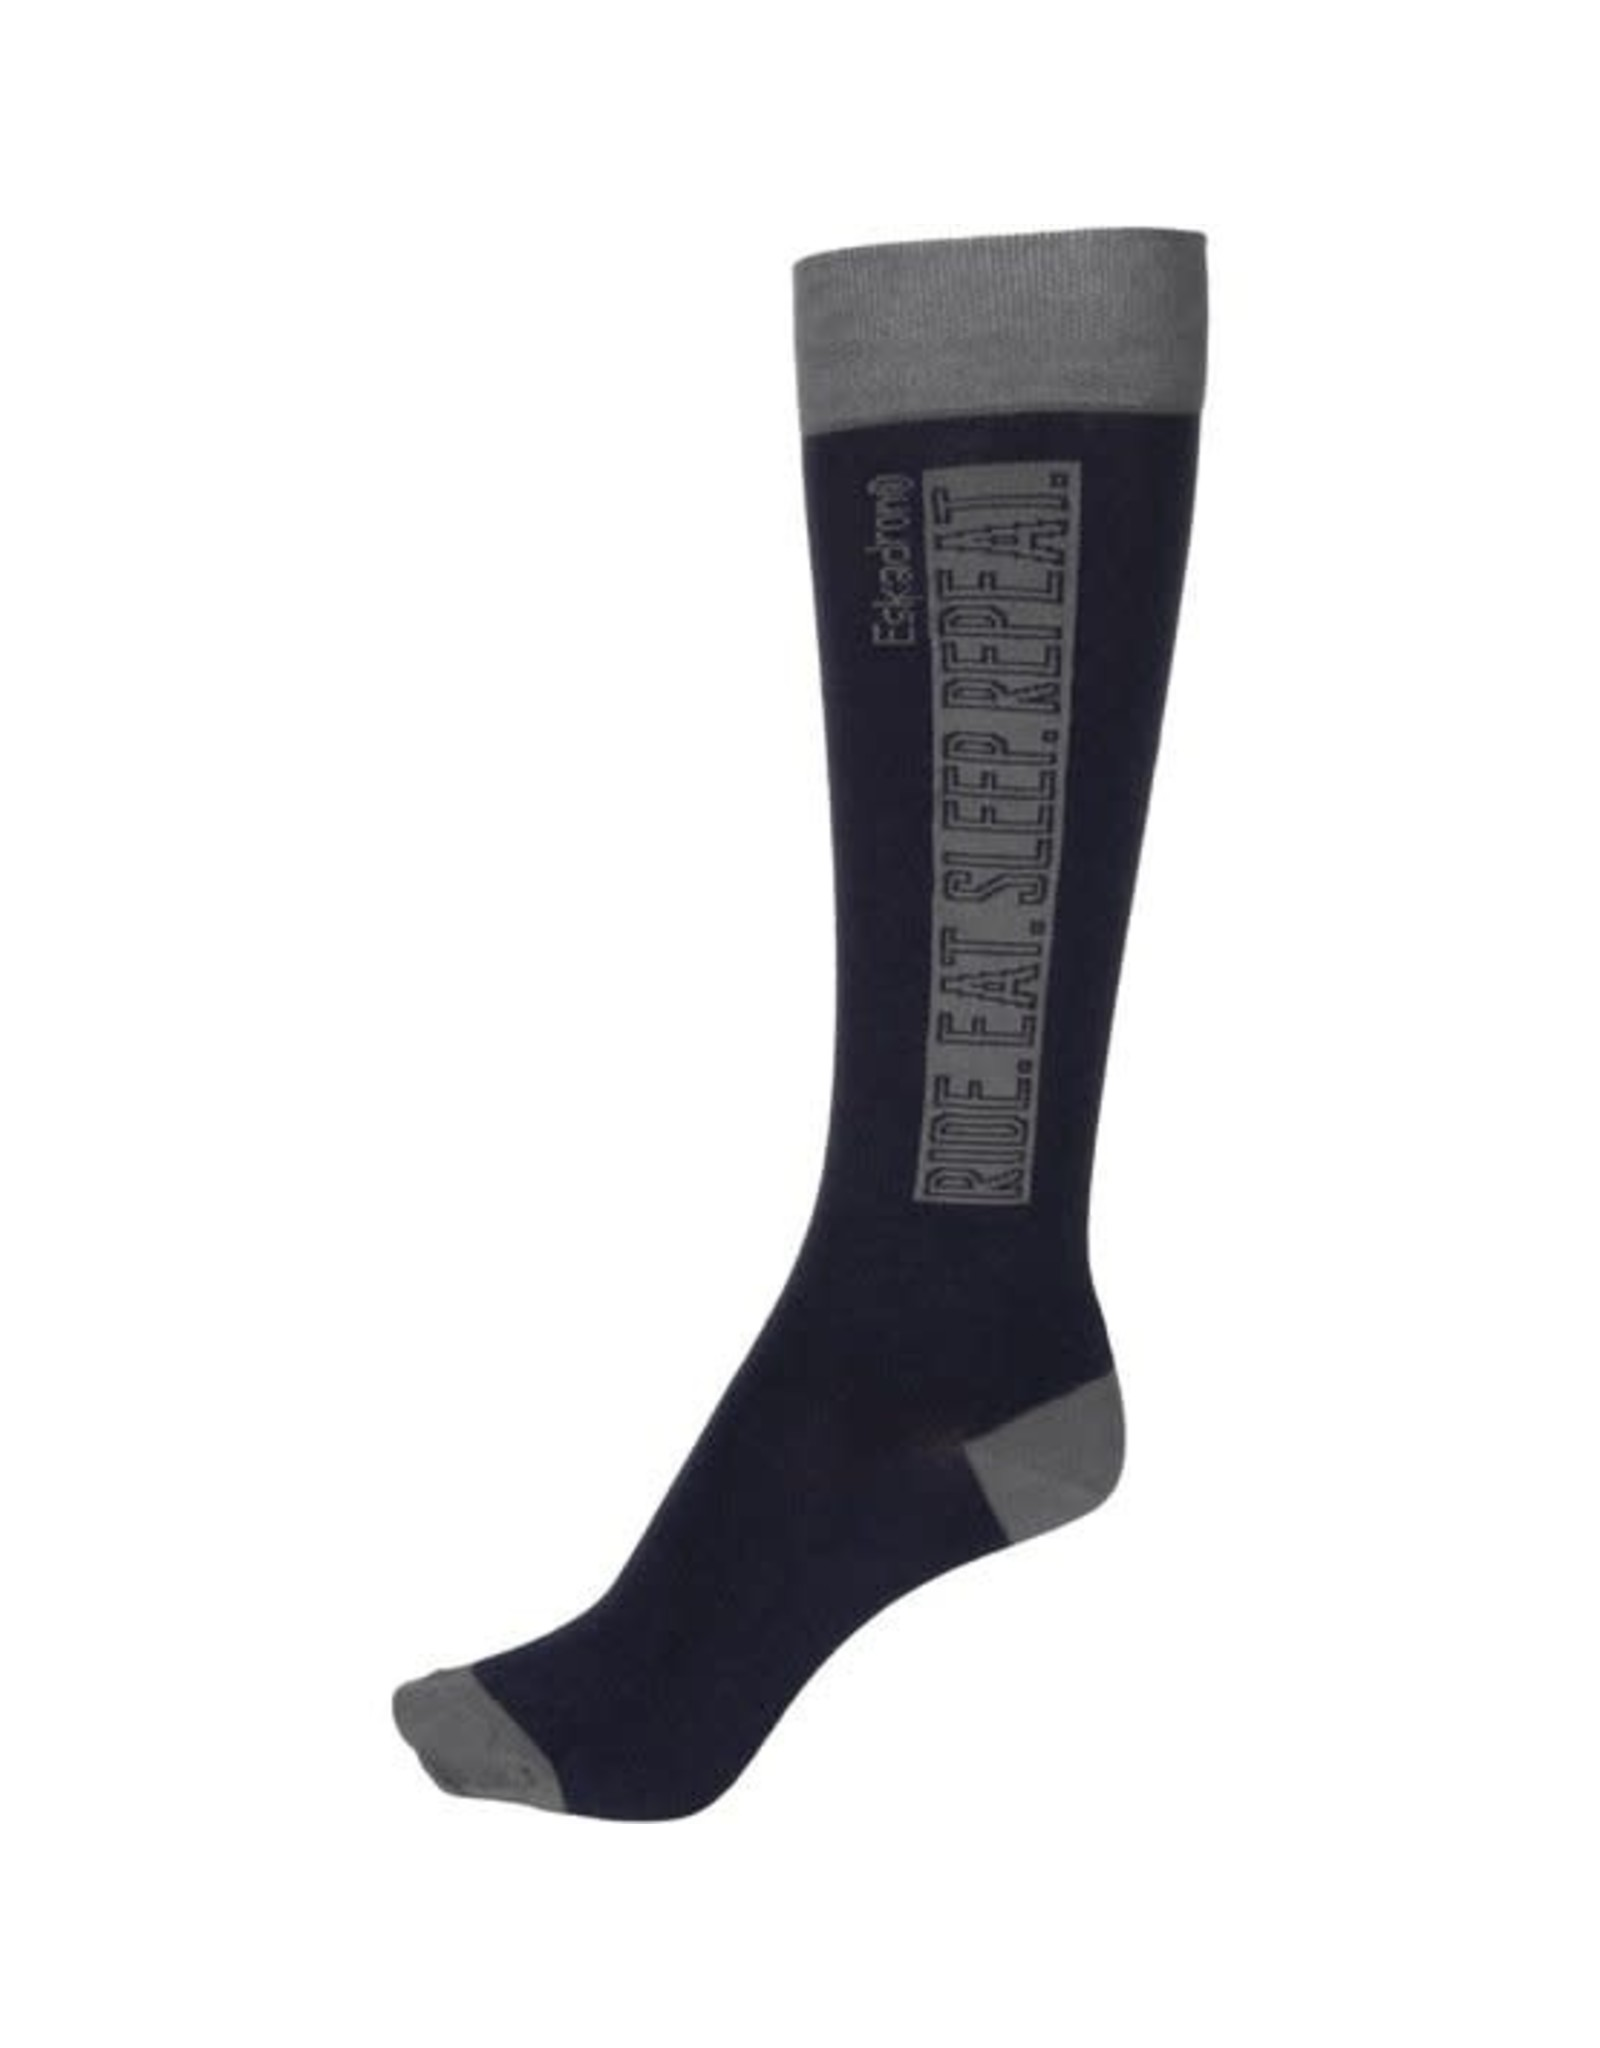 Eskadron Eskadron Knee Socks Equestrian Fanatics Navy/Grey